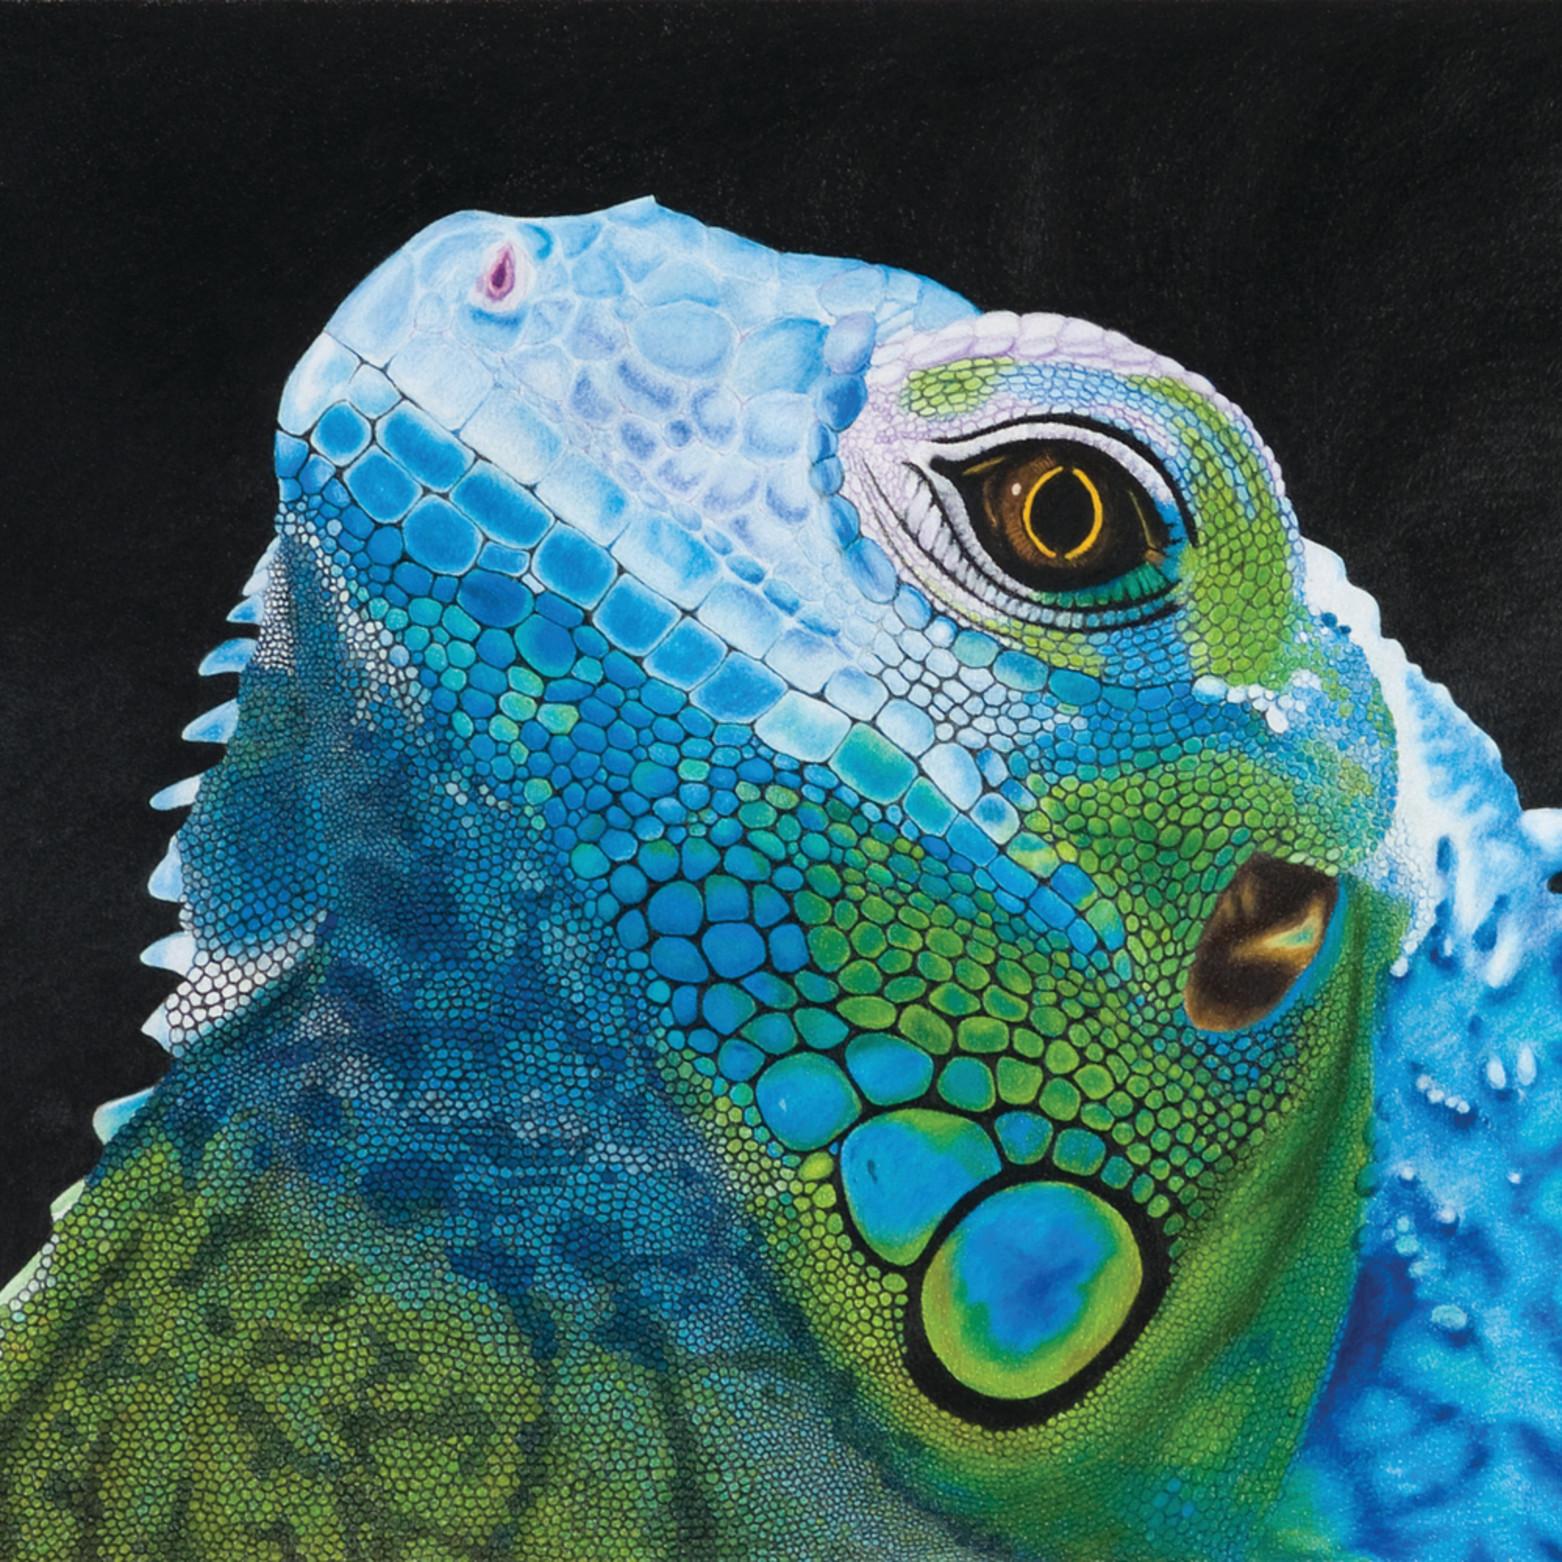 I iguana gdq5zp